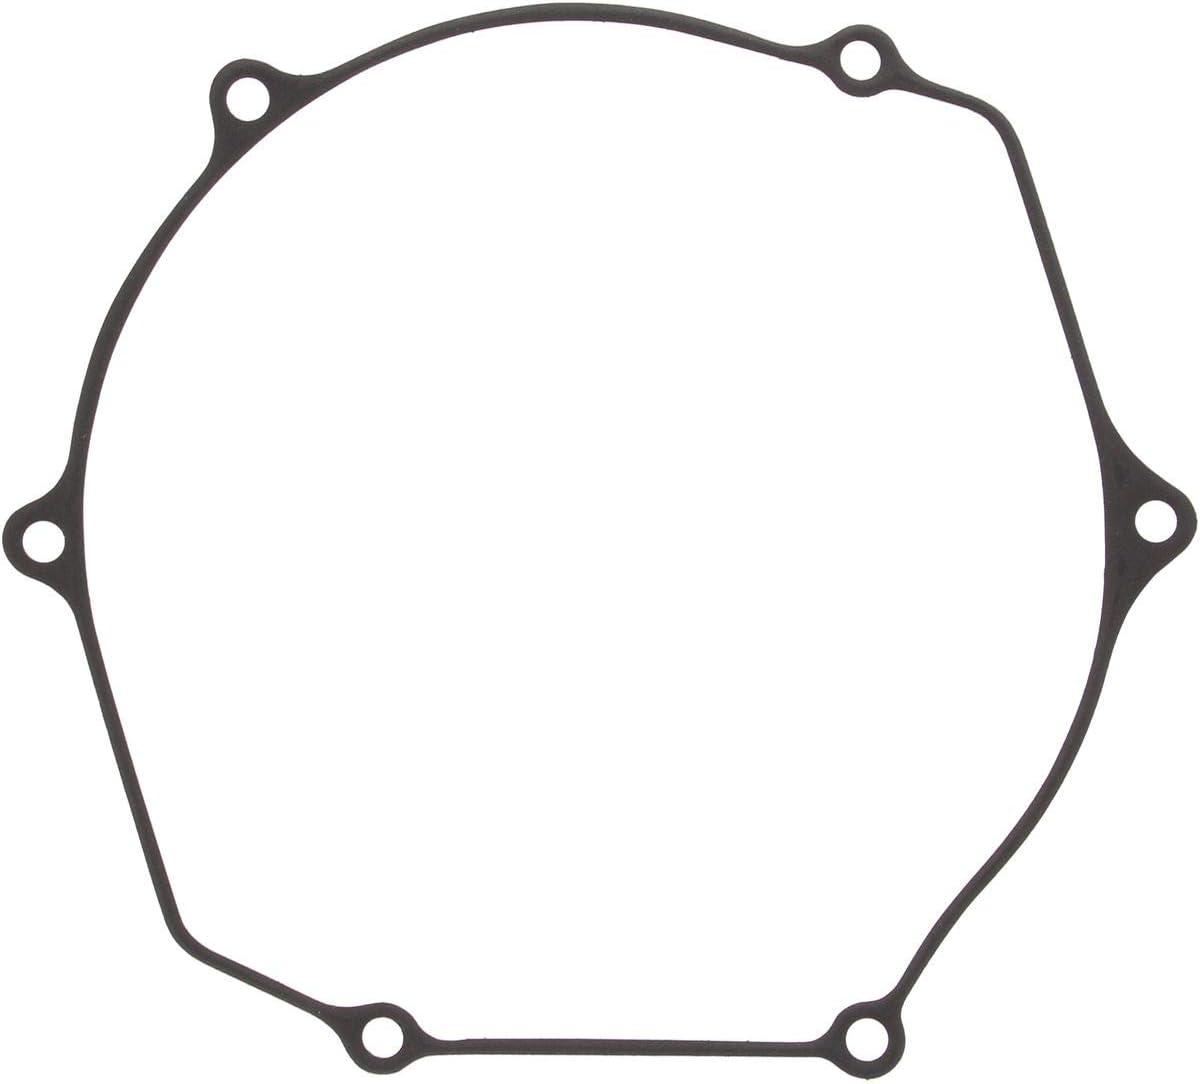 Vertex-Winderosa 816169 Clutch Cover Gasket